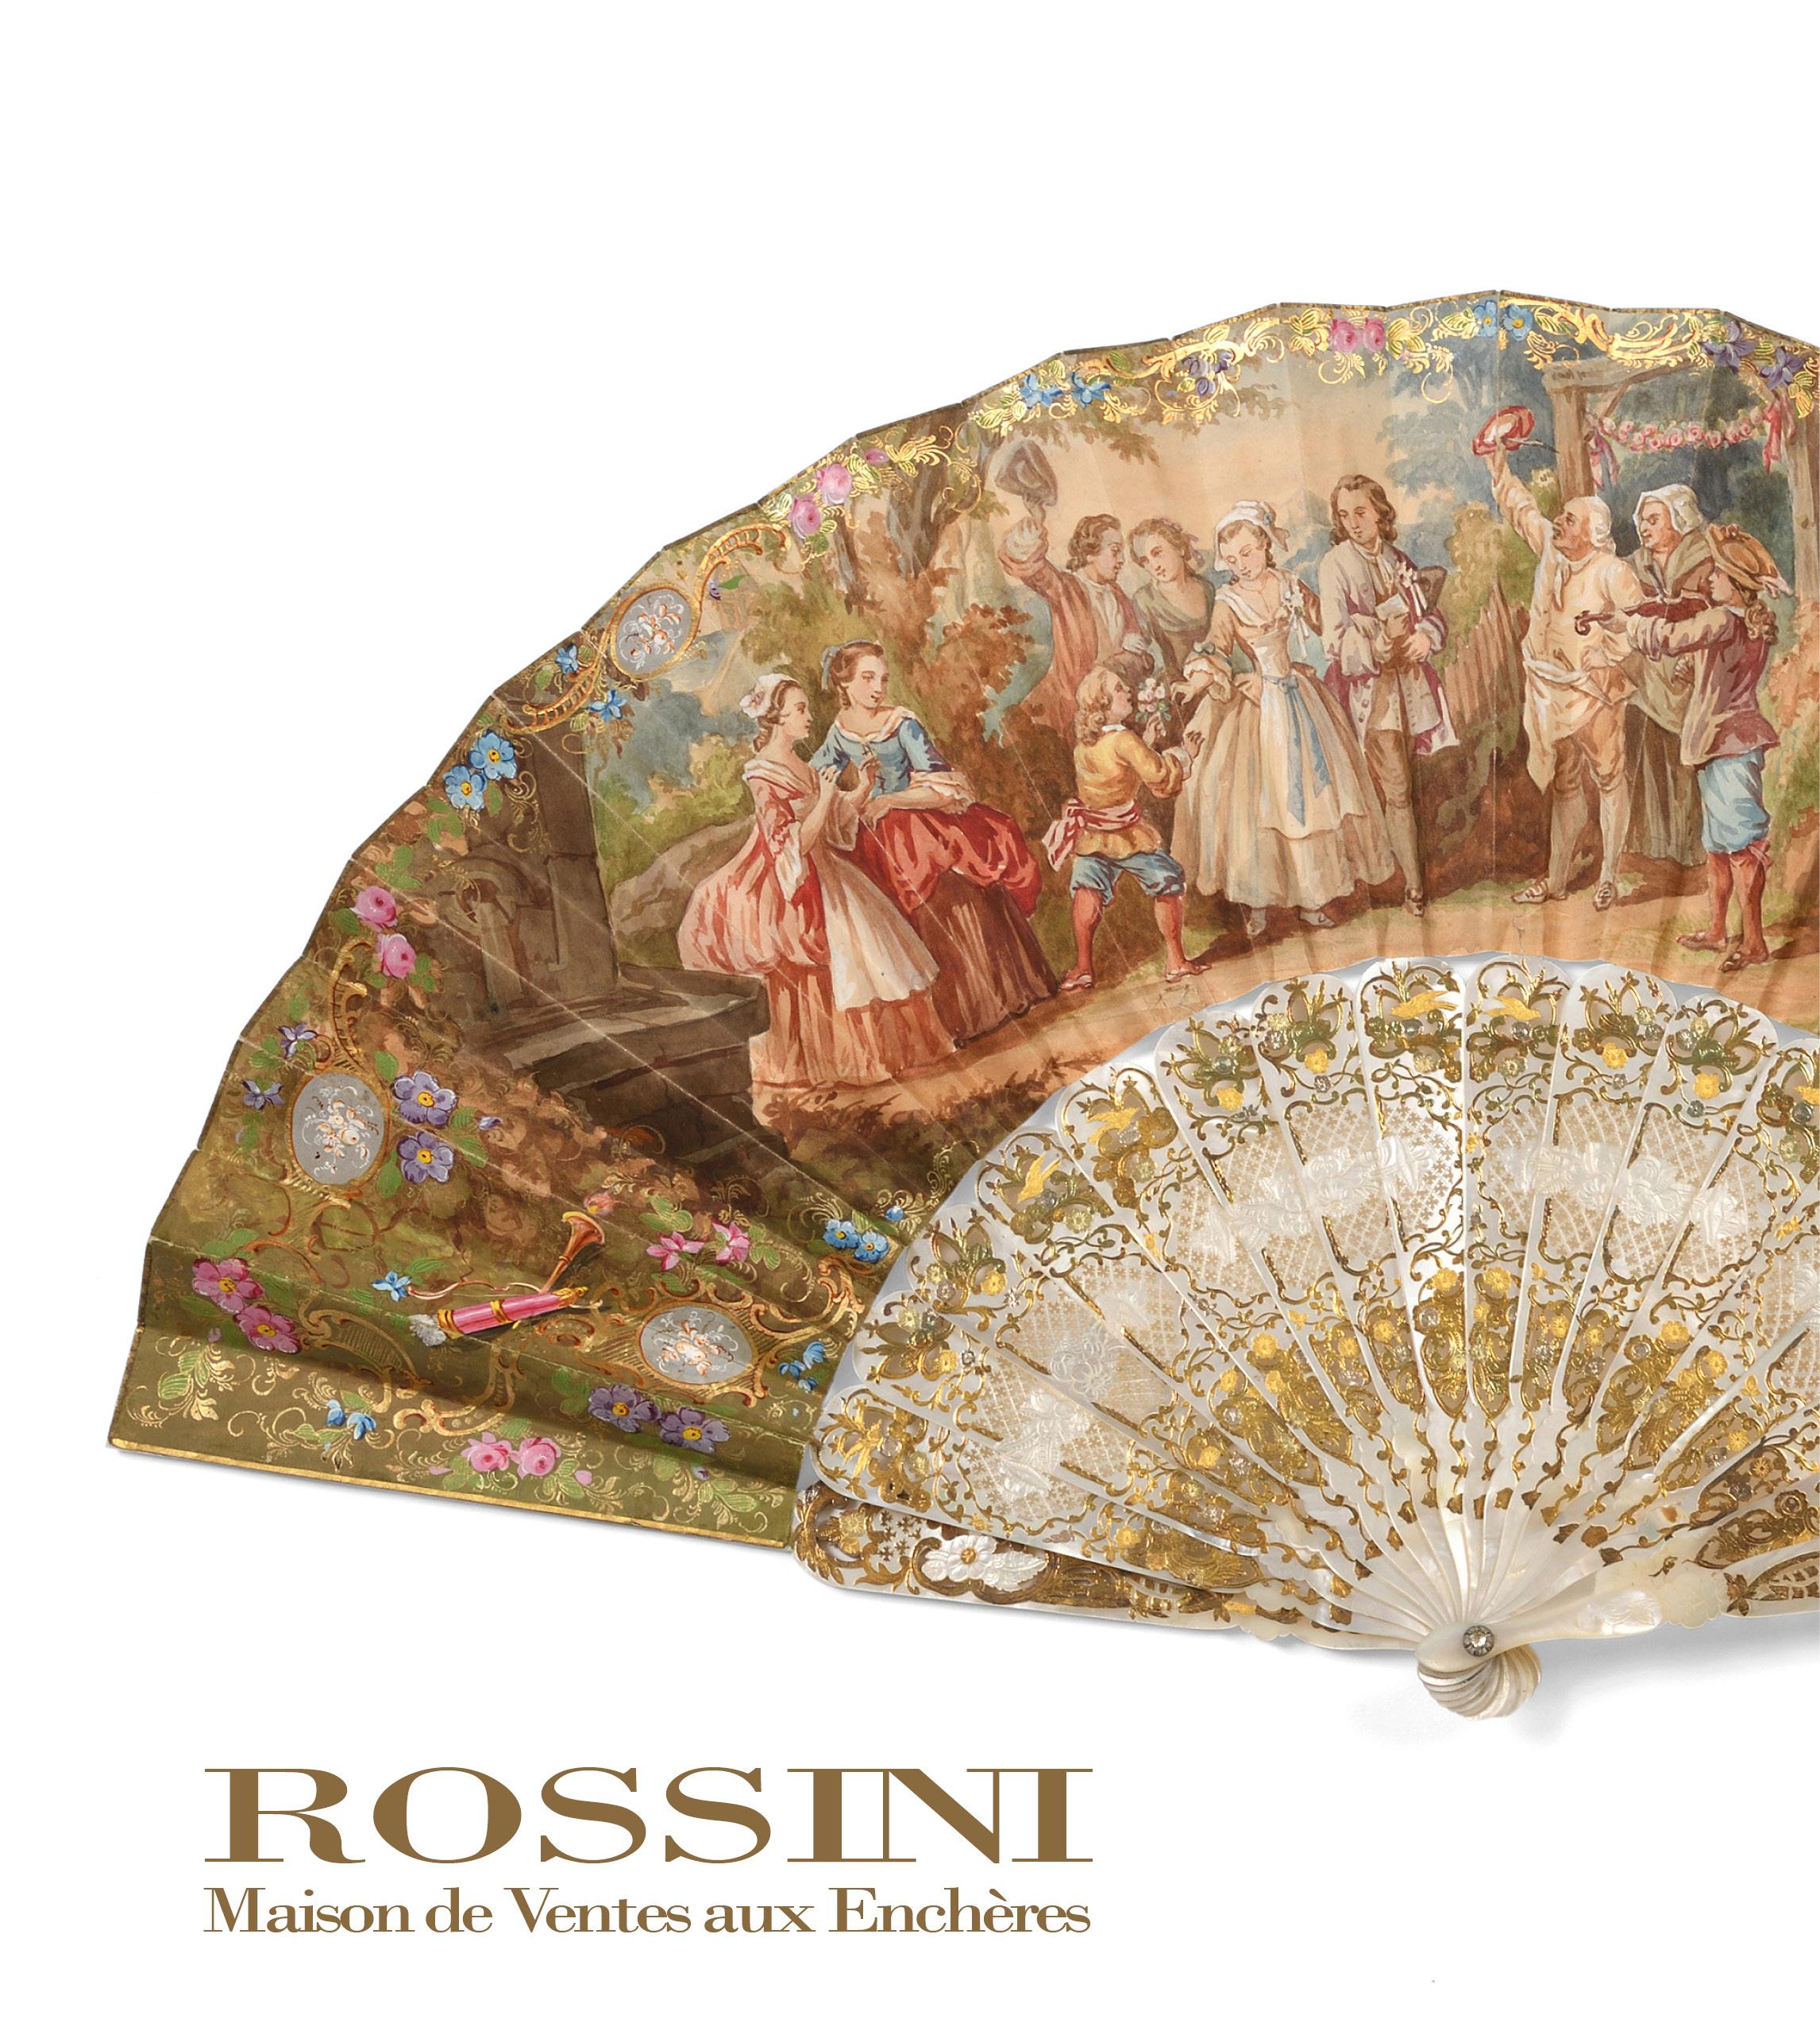 Vente Eventails & Objets de Vitrine chez Rossini : 329 lots